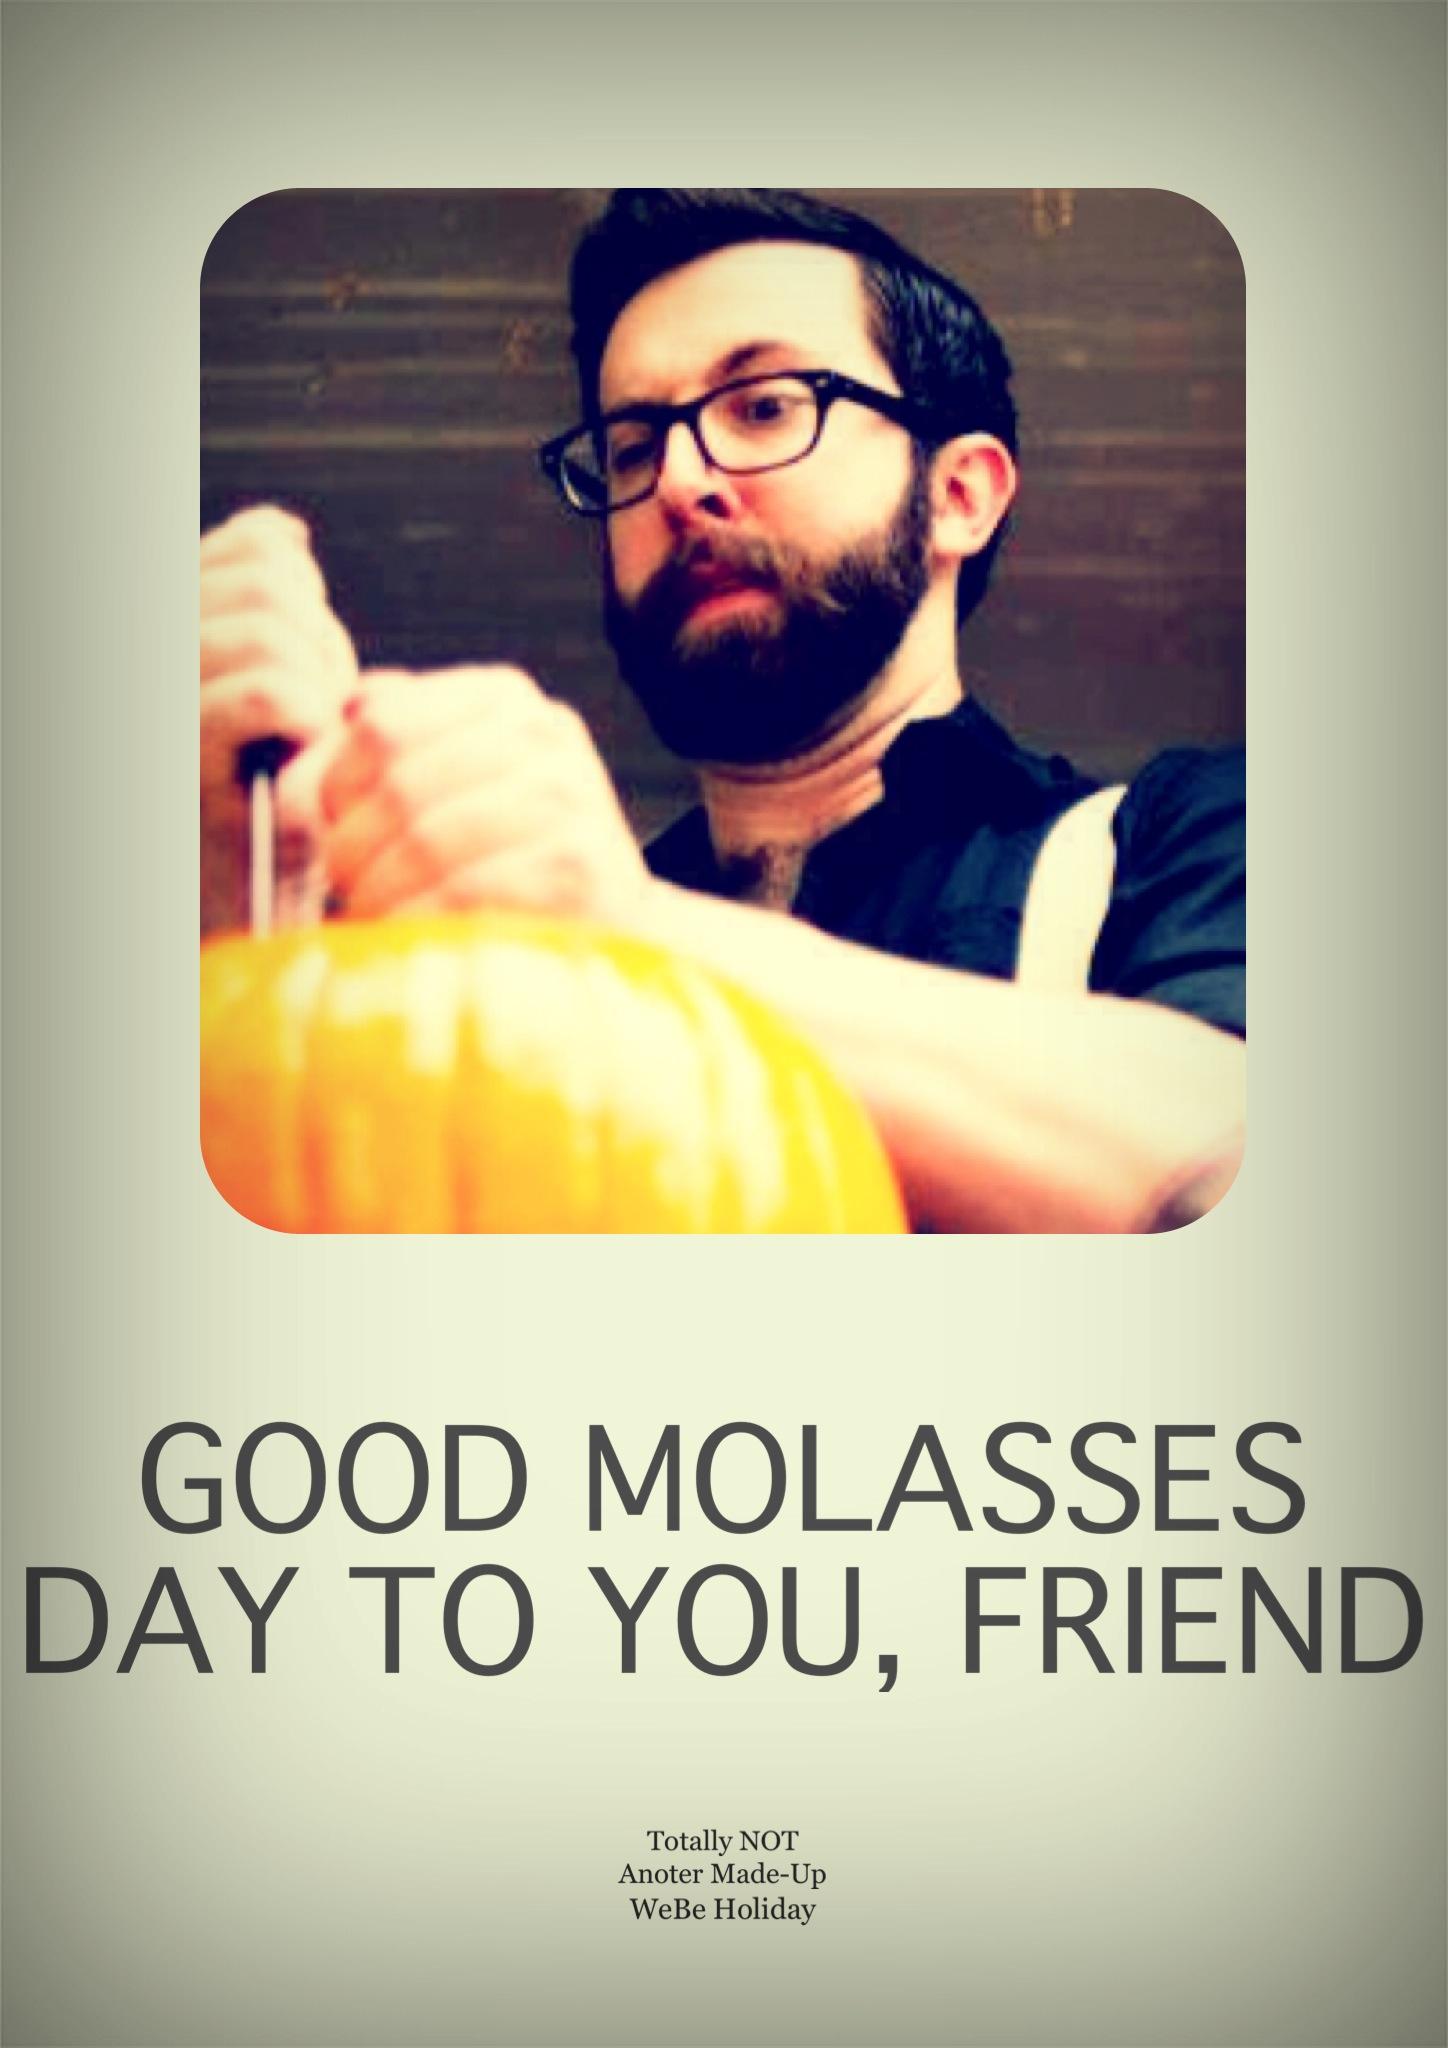 Molasses Day 2013 - Tristan 01.jpg